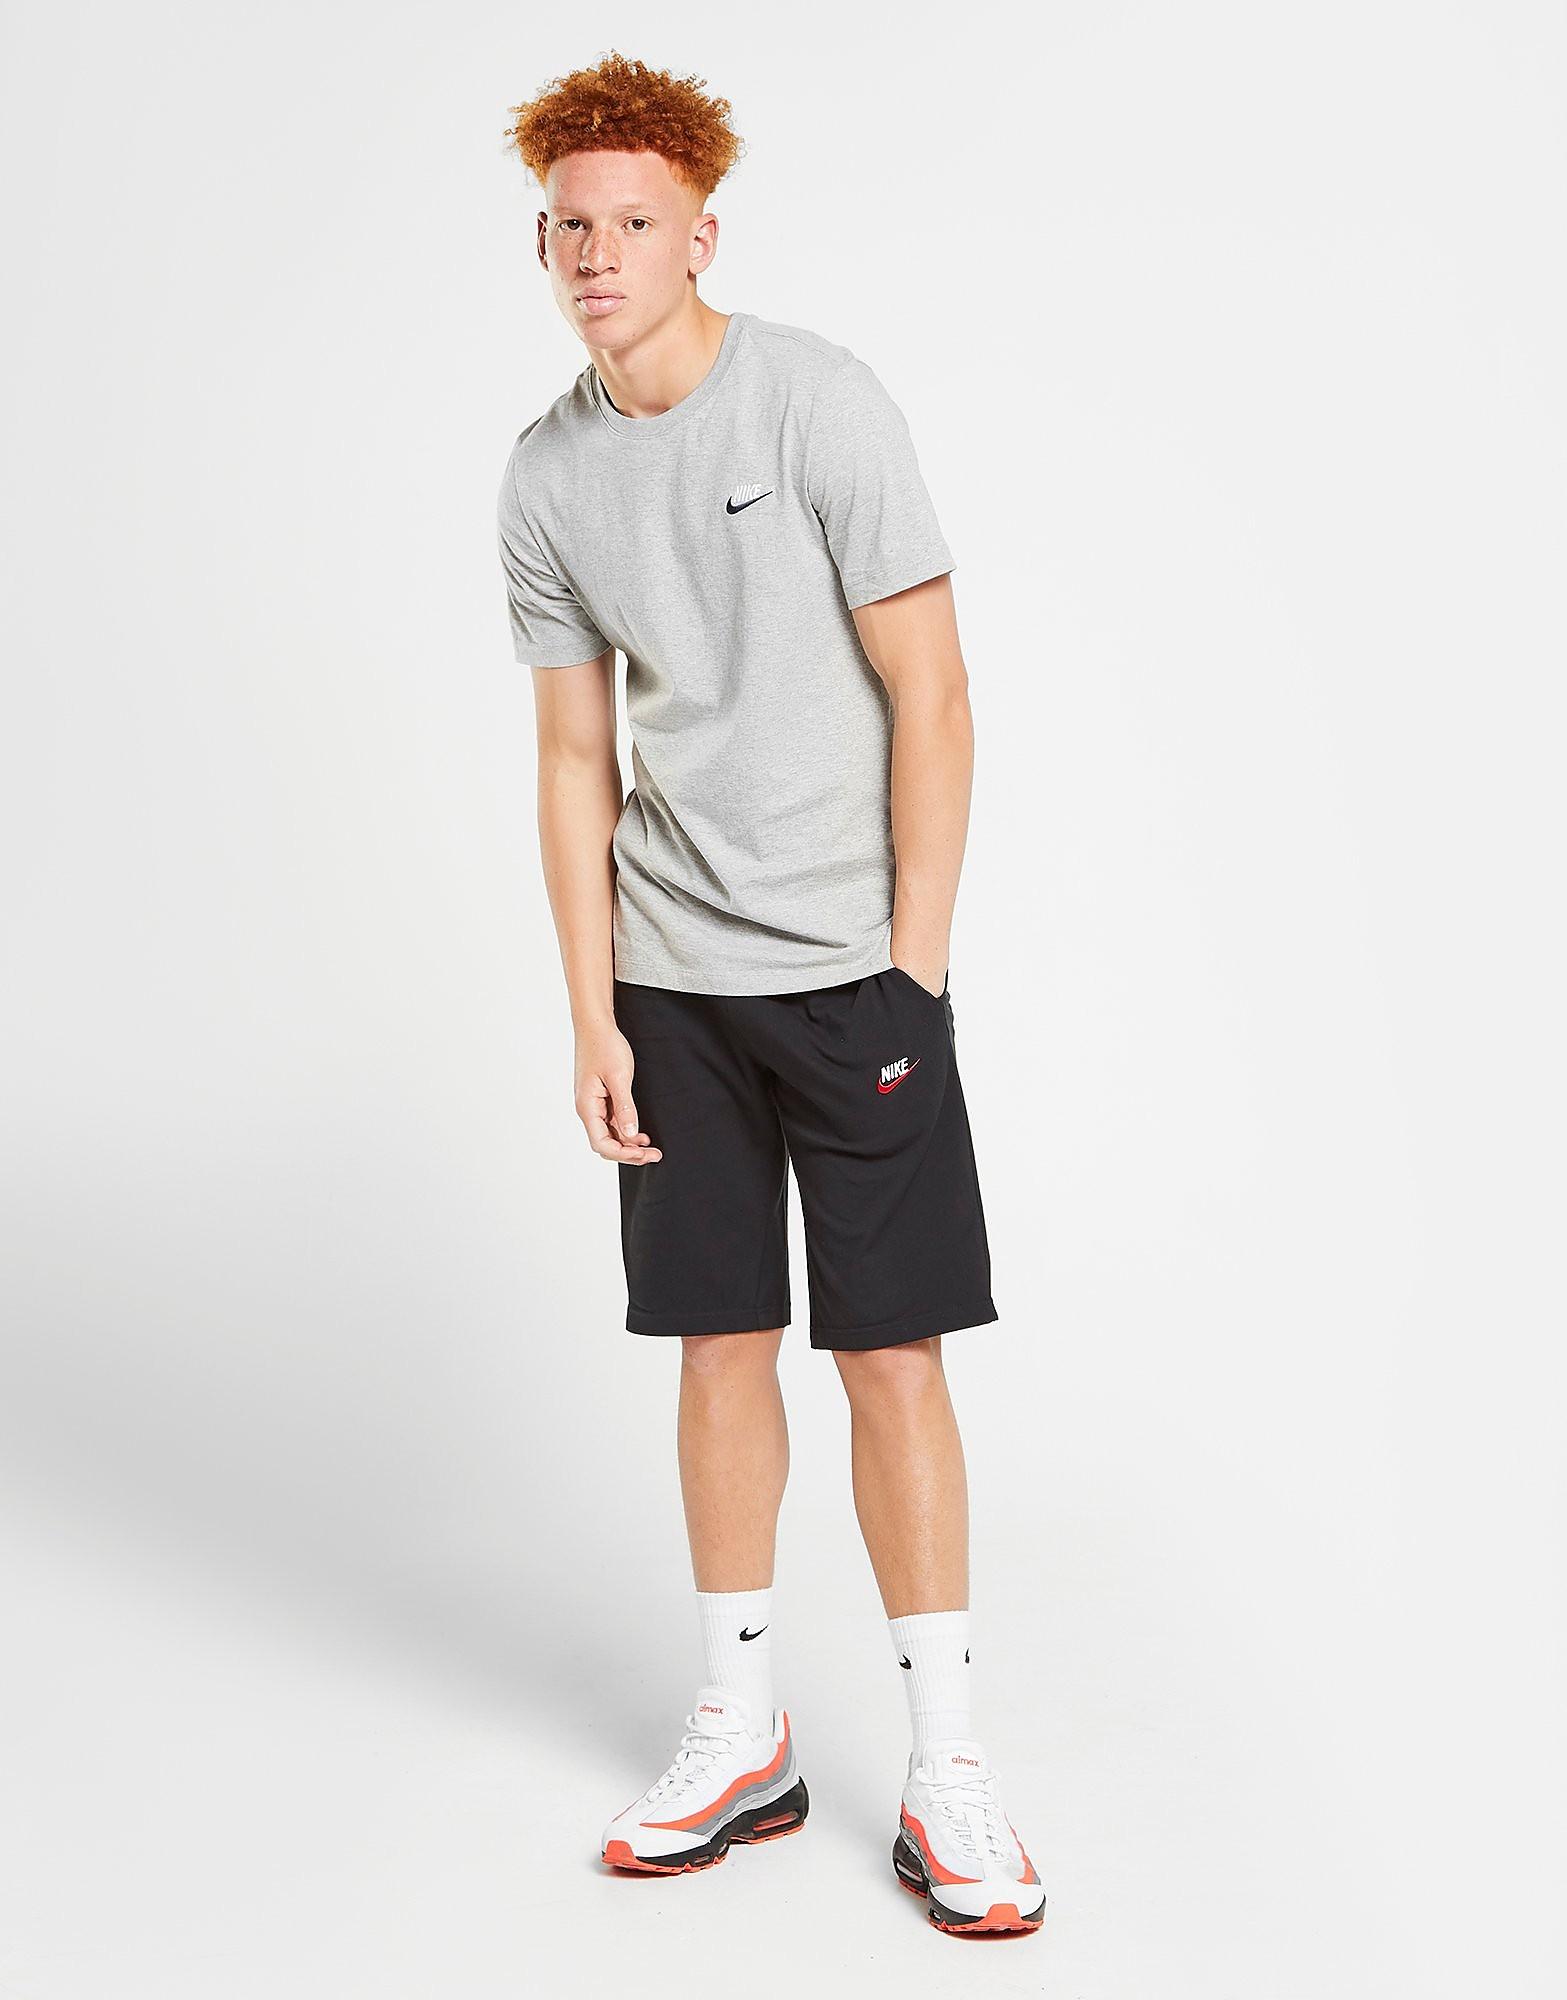 Nike Foundation Jersey Shorts - Only at JD - Noir, Noir